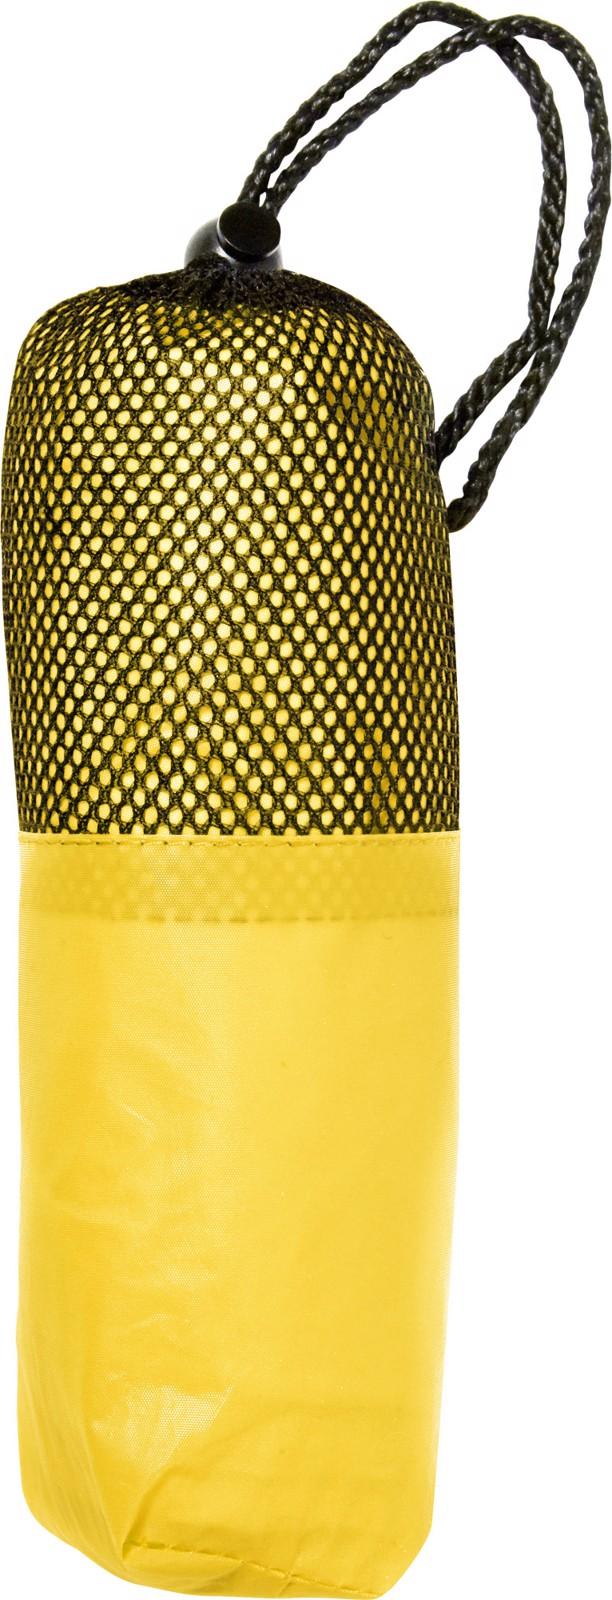 PEVA poncho - Yellow